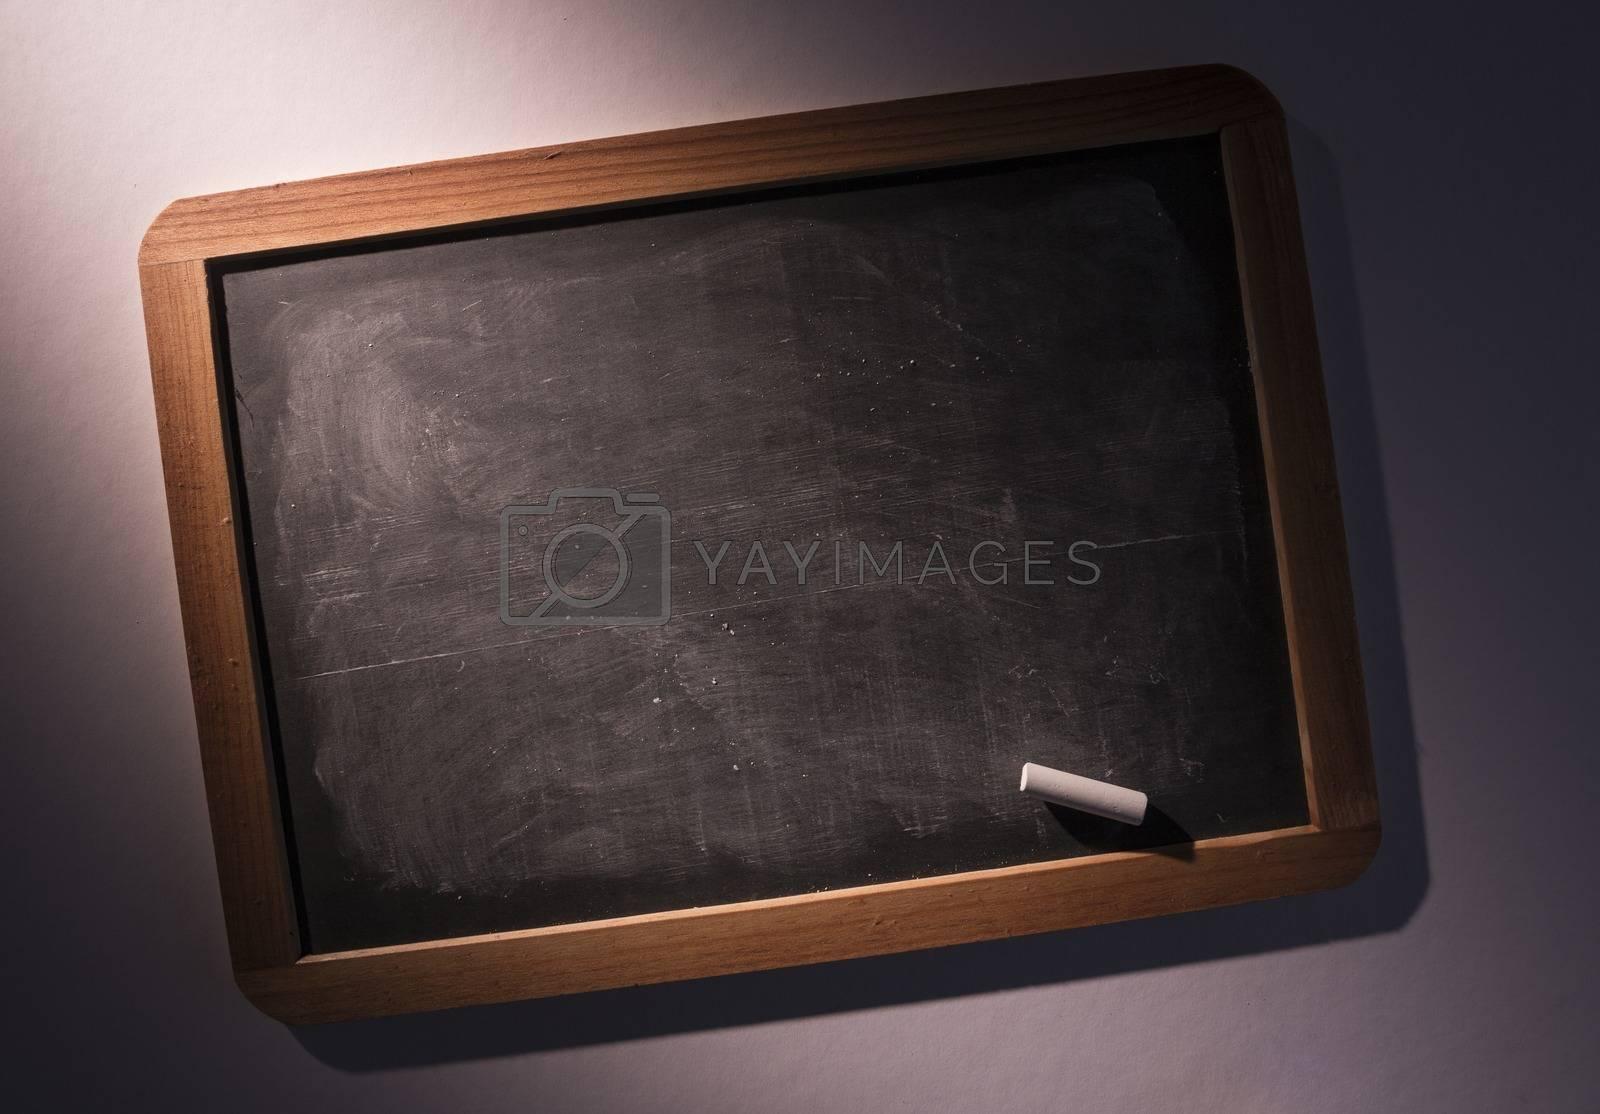 Royalty free image of Chalkboard with chalk by Wavebreakmedia